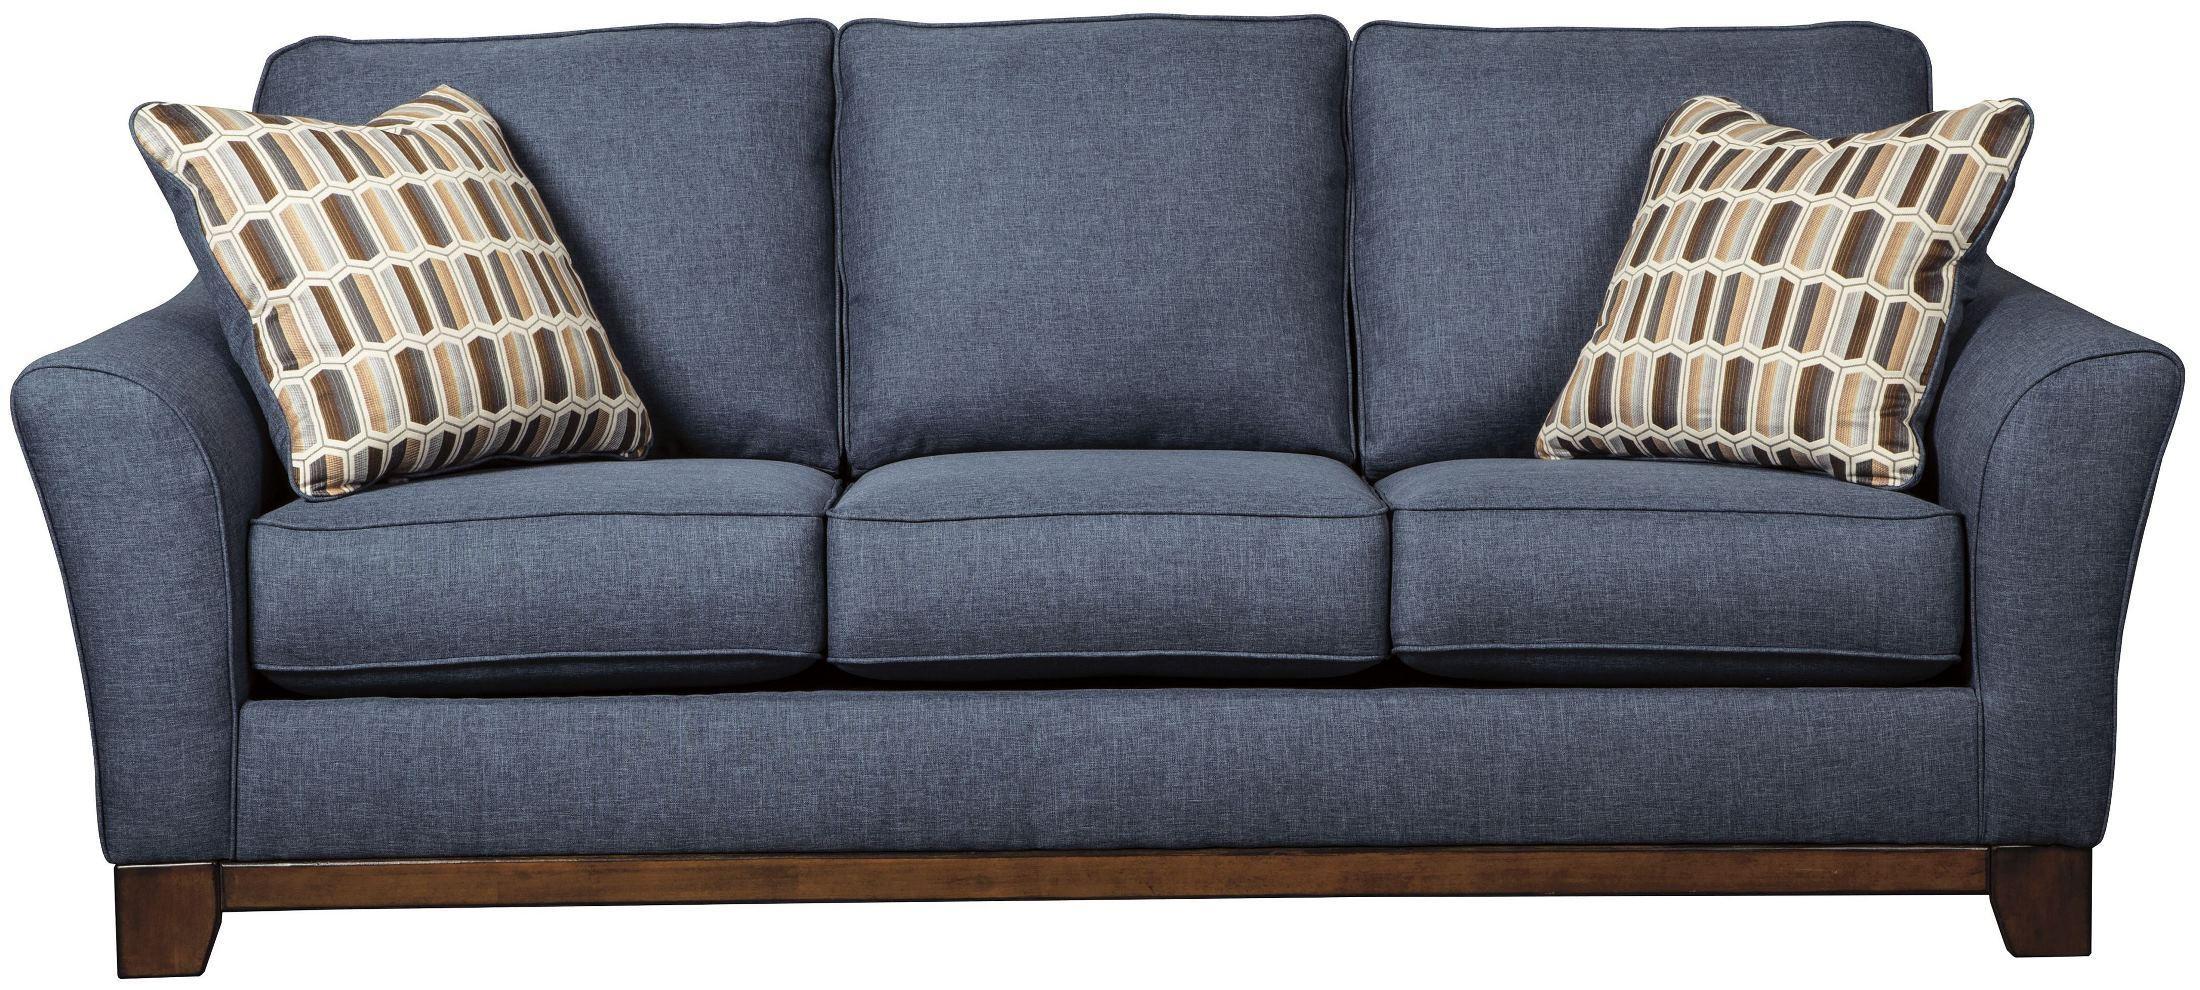 Janley Denim Sofa regarding Denim Sofas and Loveseats